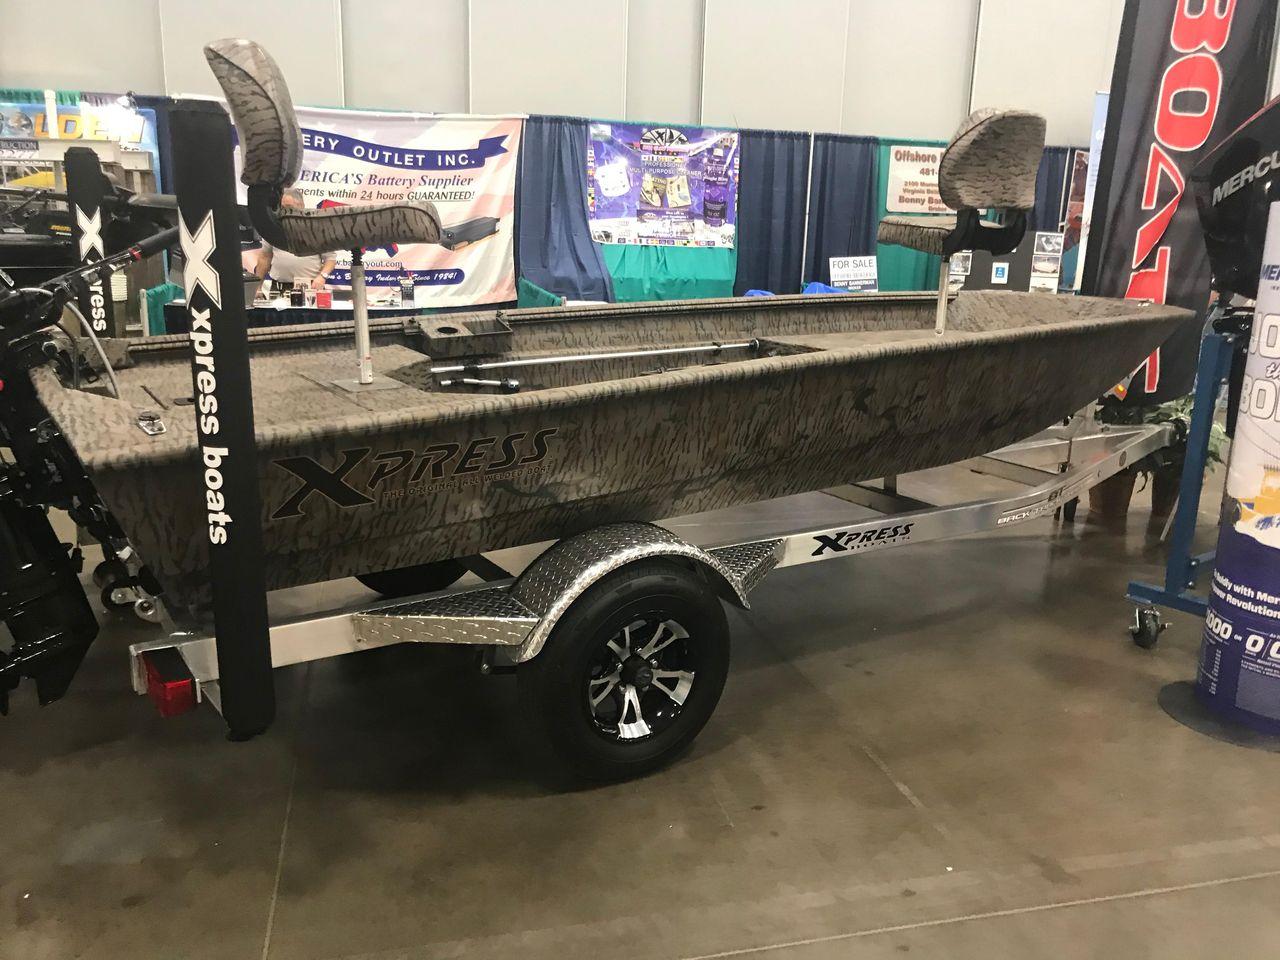 2019 Used Xpress H15DBXH15DBX Jon Boat For Sale - $9,900 - Norfolk